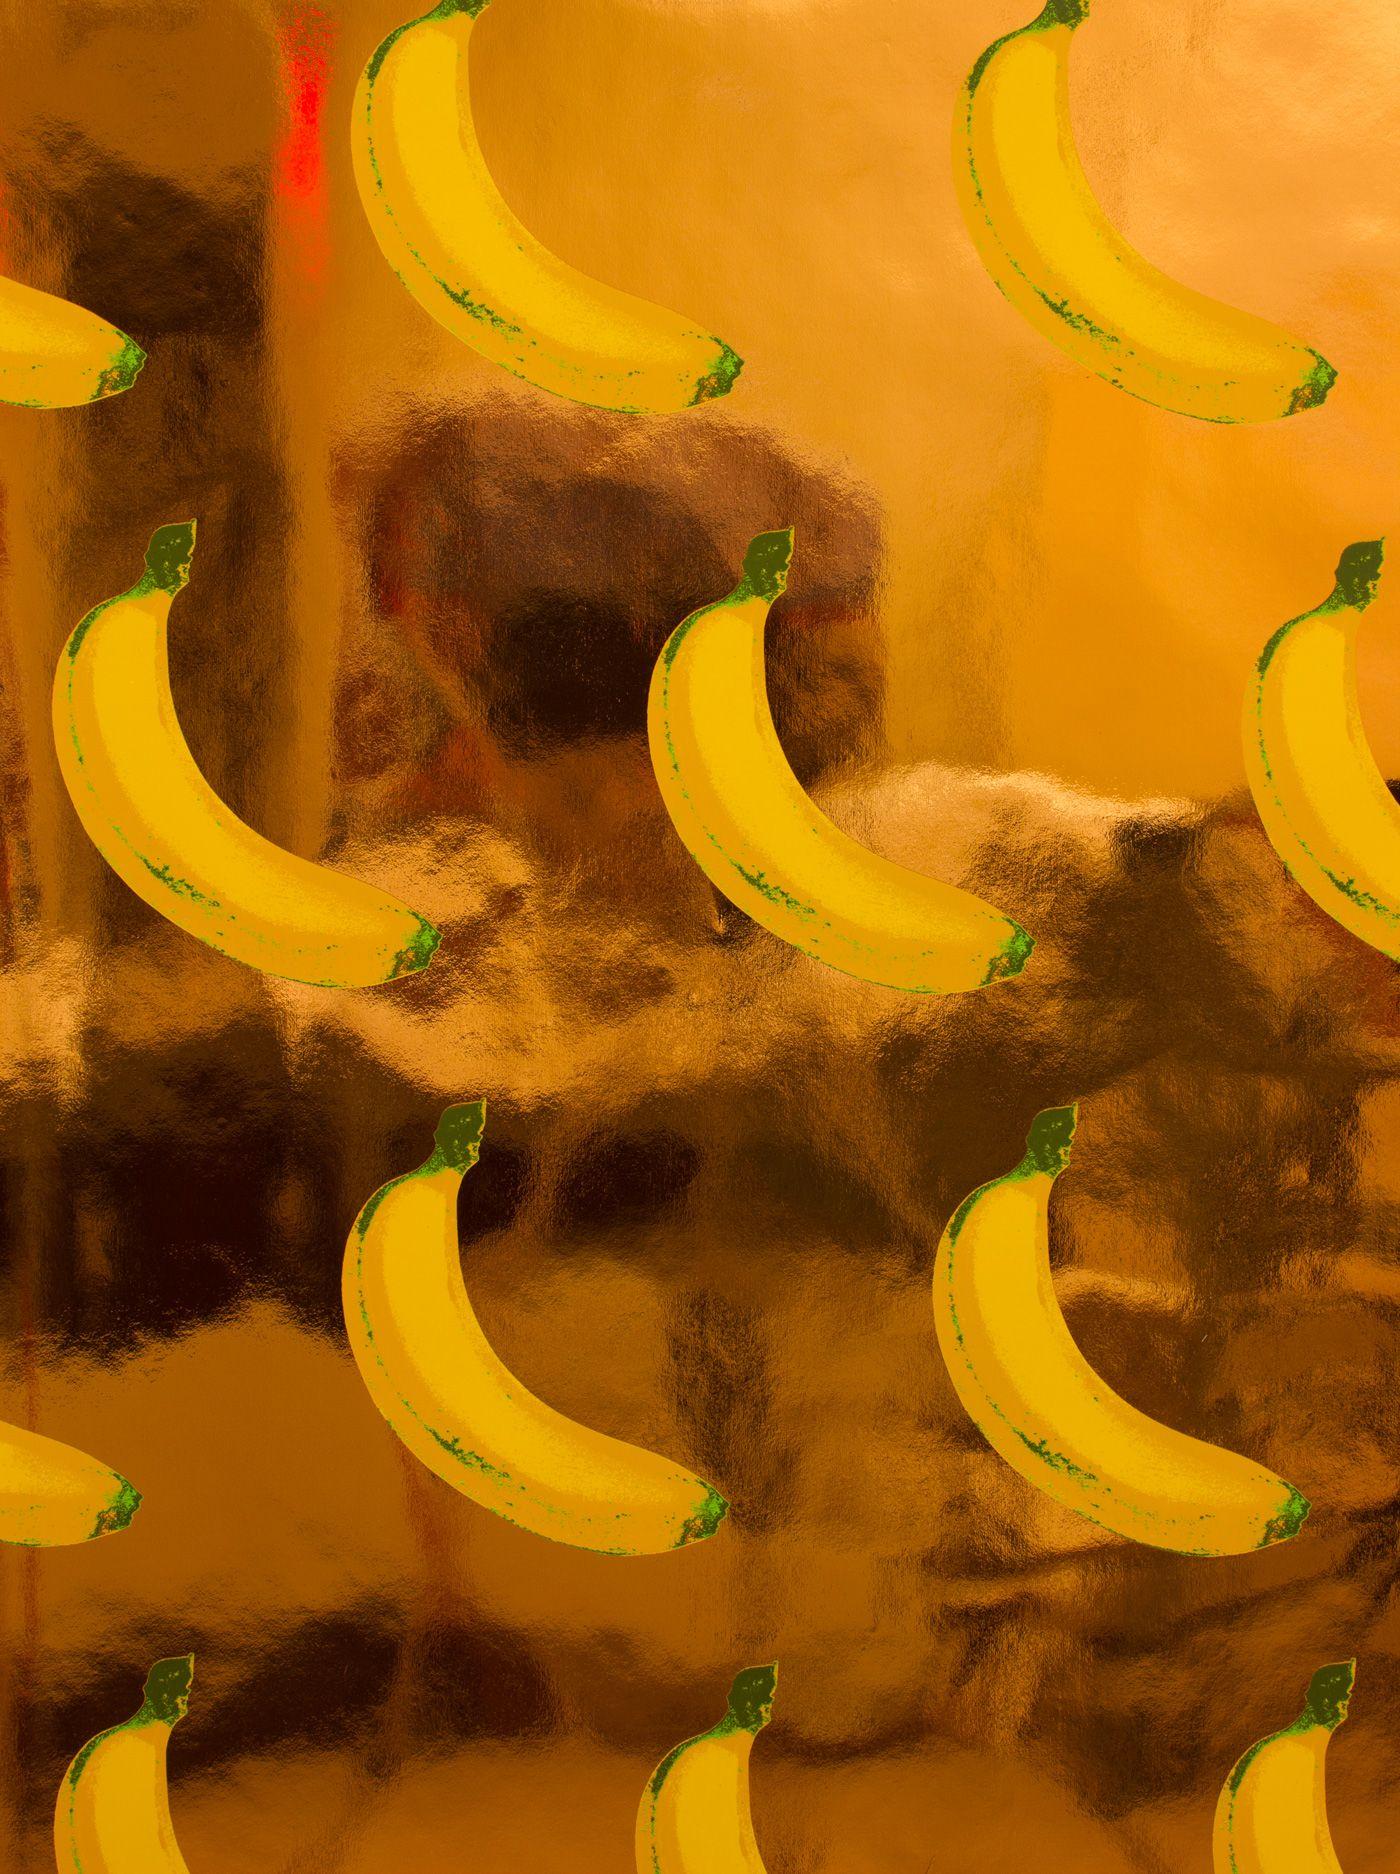 BANANAS! Flavor Paper Tasty Handscreened and